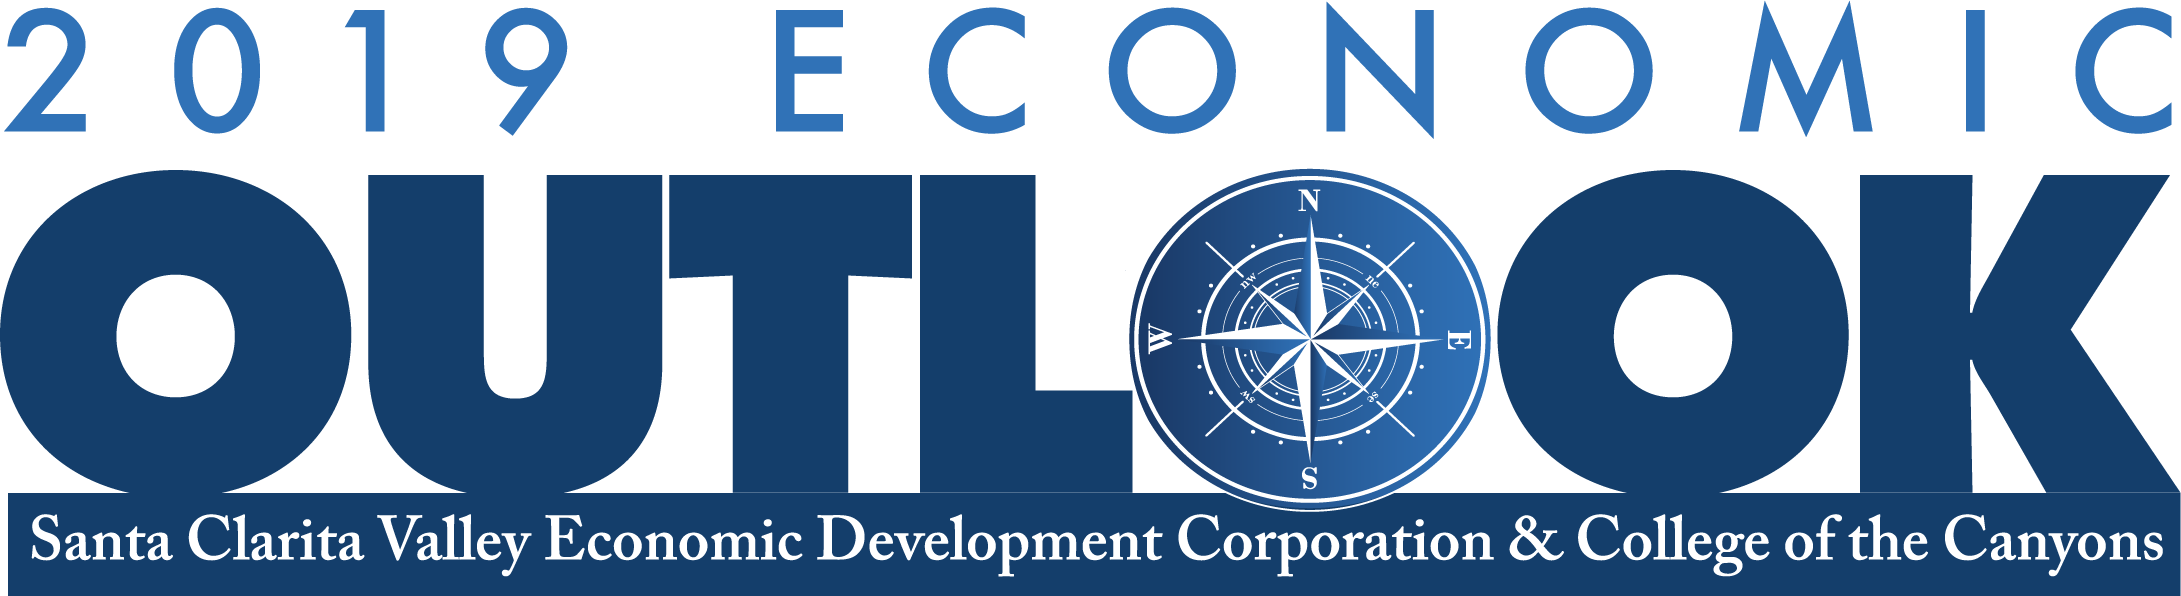 SCV_ECONOutlook_logo2019